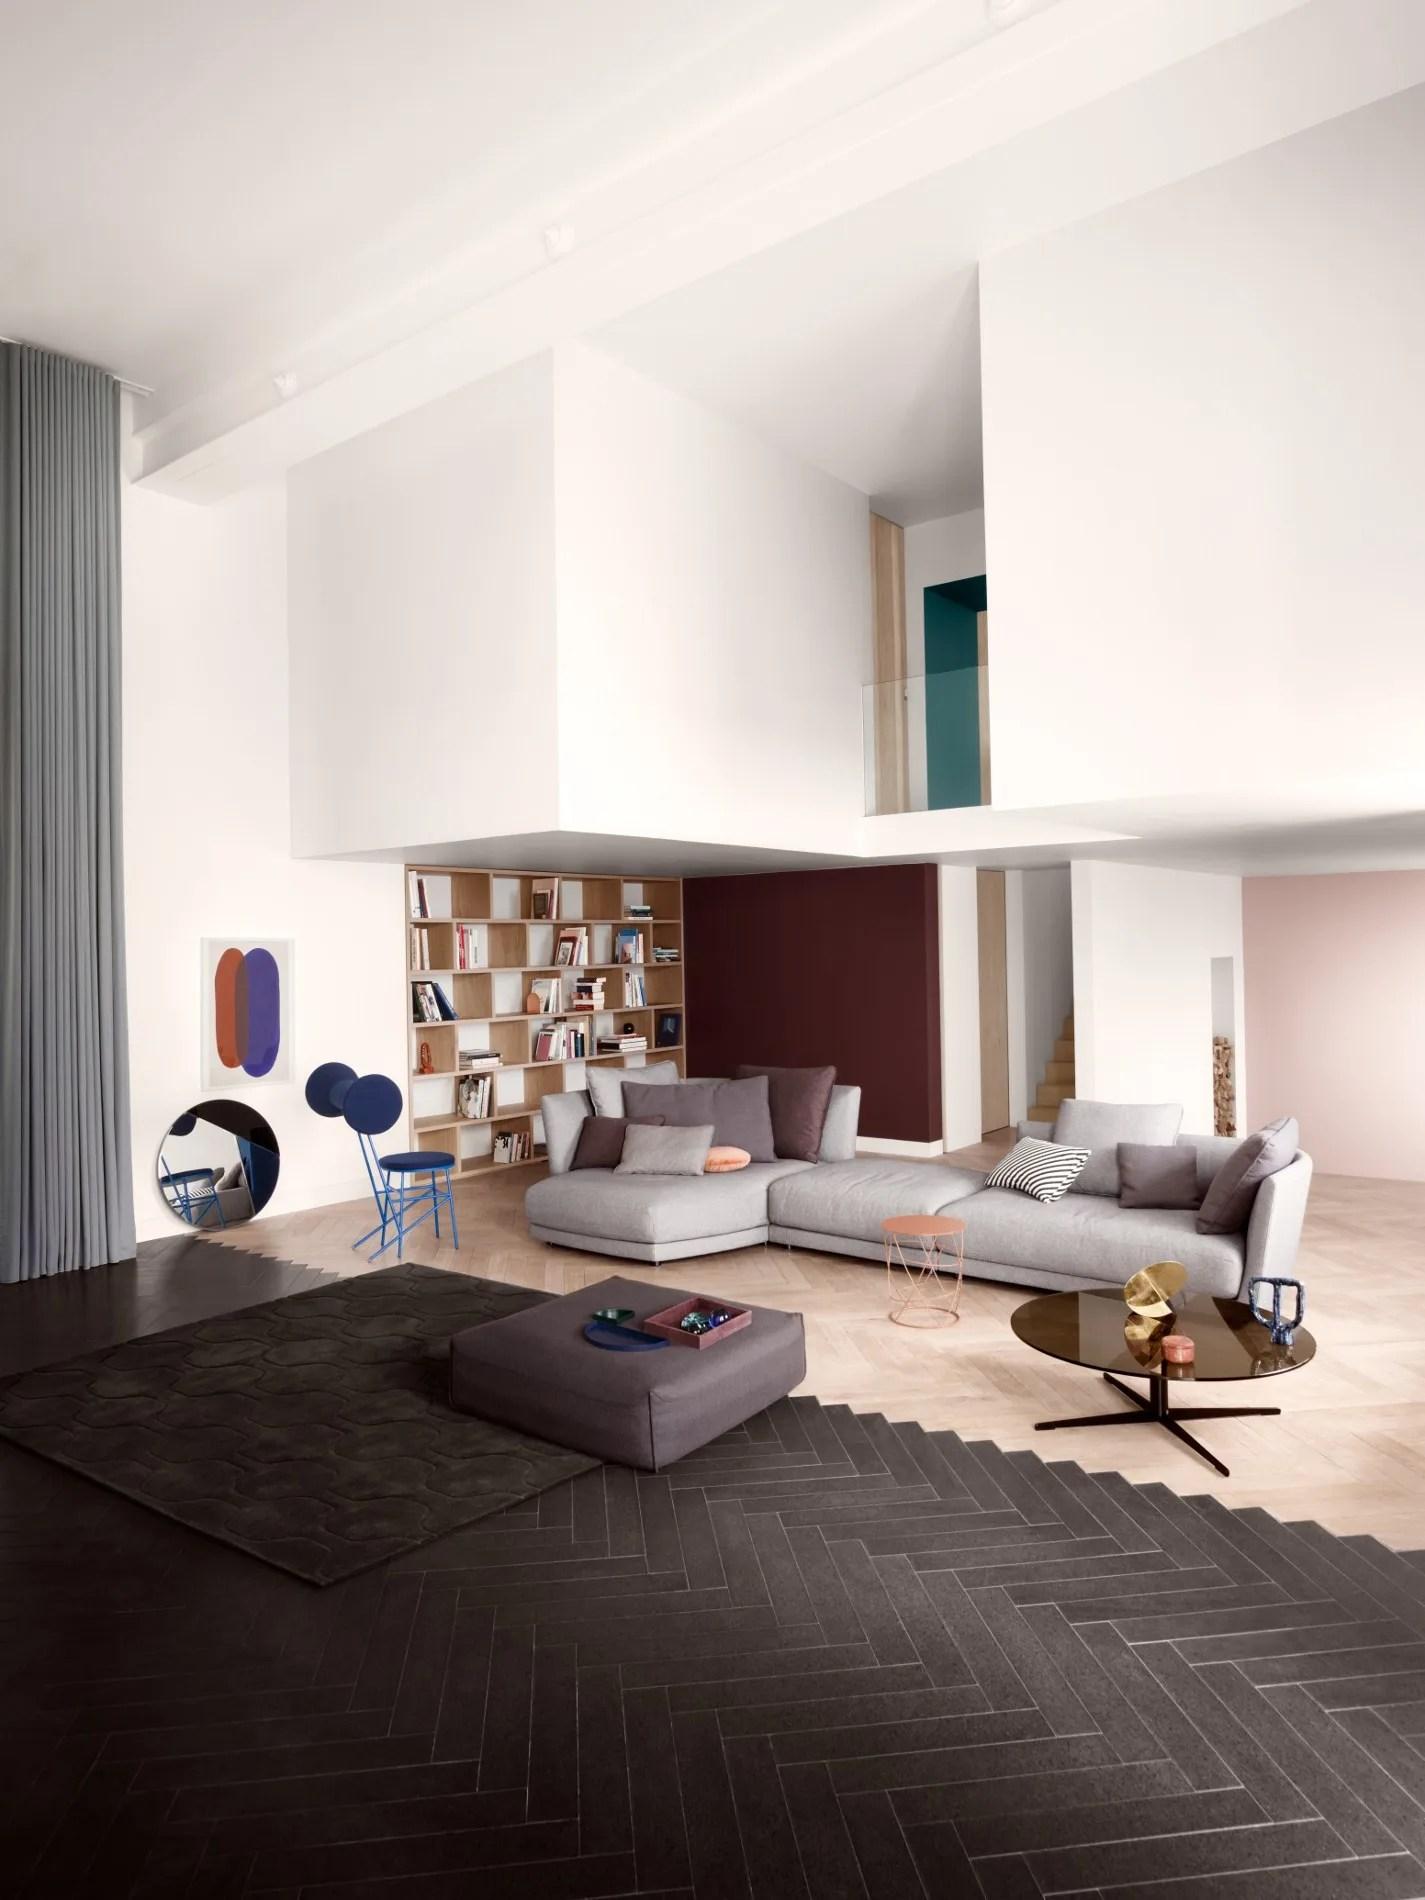 best contemporary sectional sofas udinese vs atlanta sofascore tondo | modular sofa by rolf benz design sebastian labs